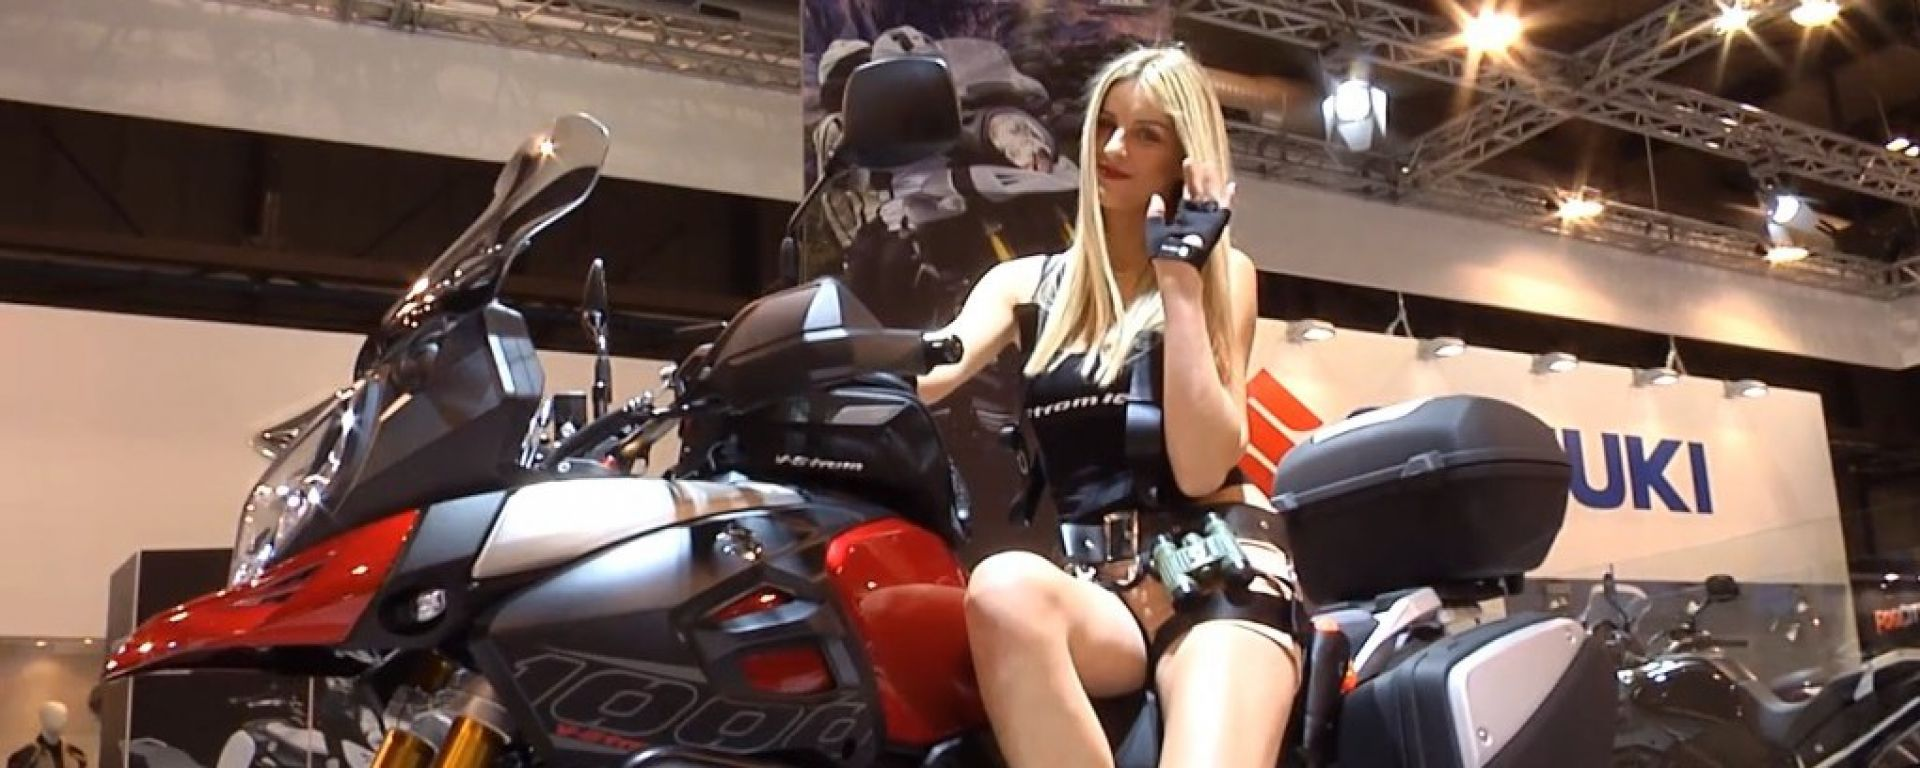 Eicma 2013, lo stand Suzuki